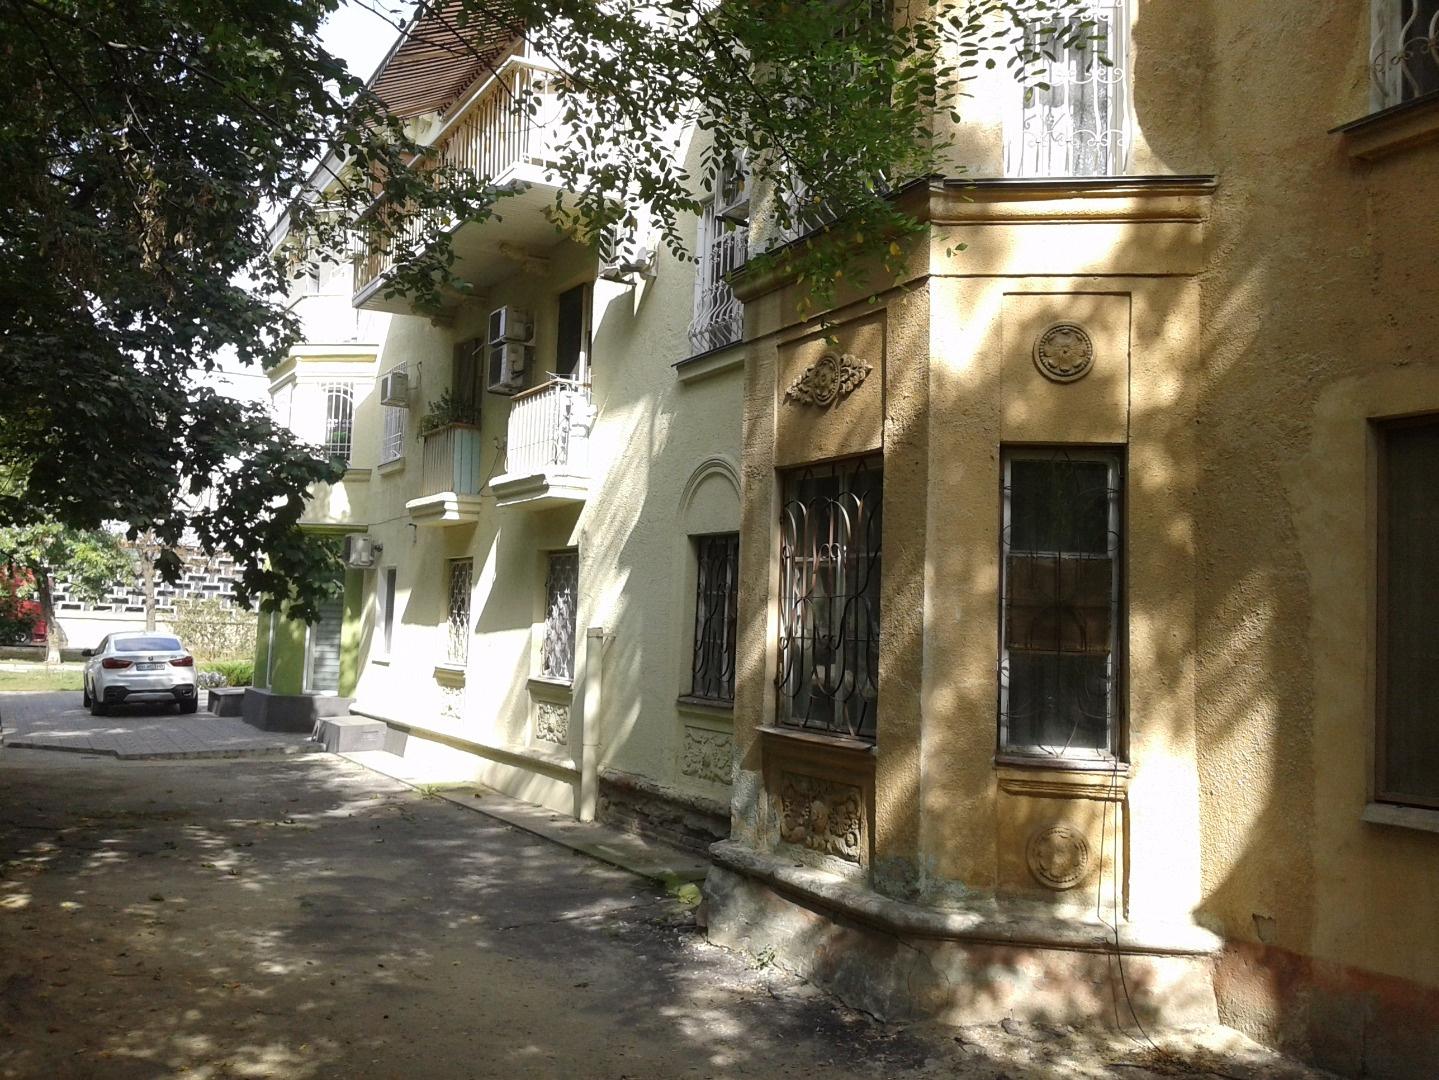 Продается 3-комнатная квартира на ул. Семинарская (Гамарника) — 80 000 у.е. (фото №6)